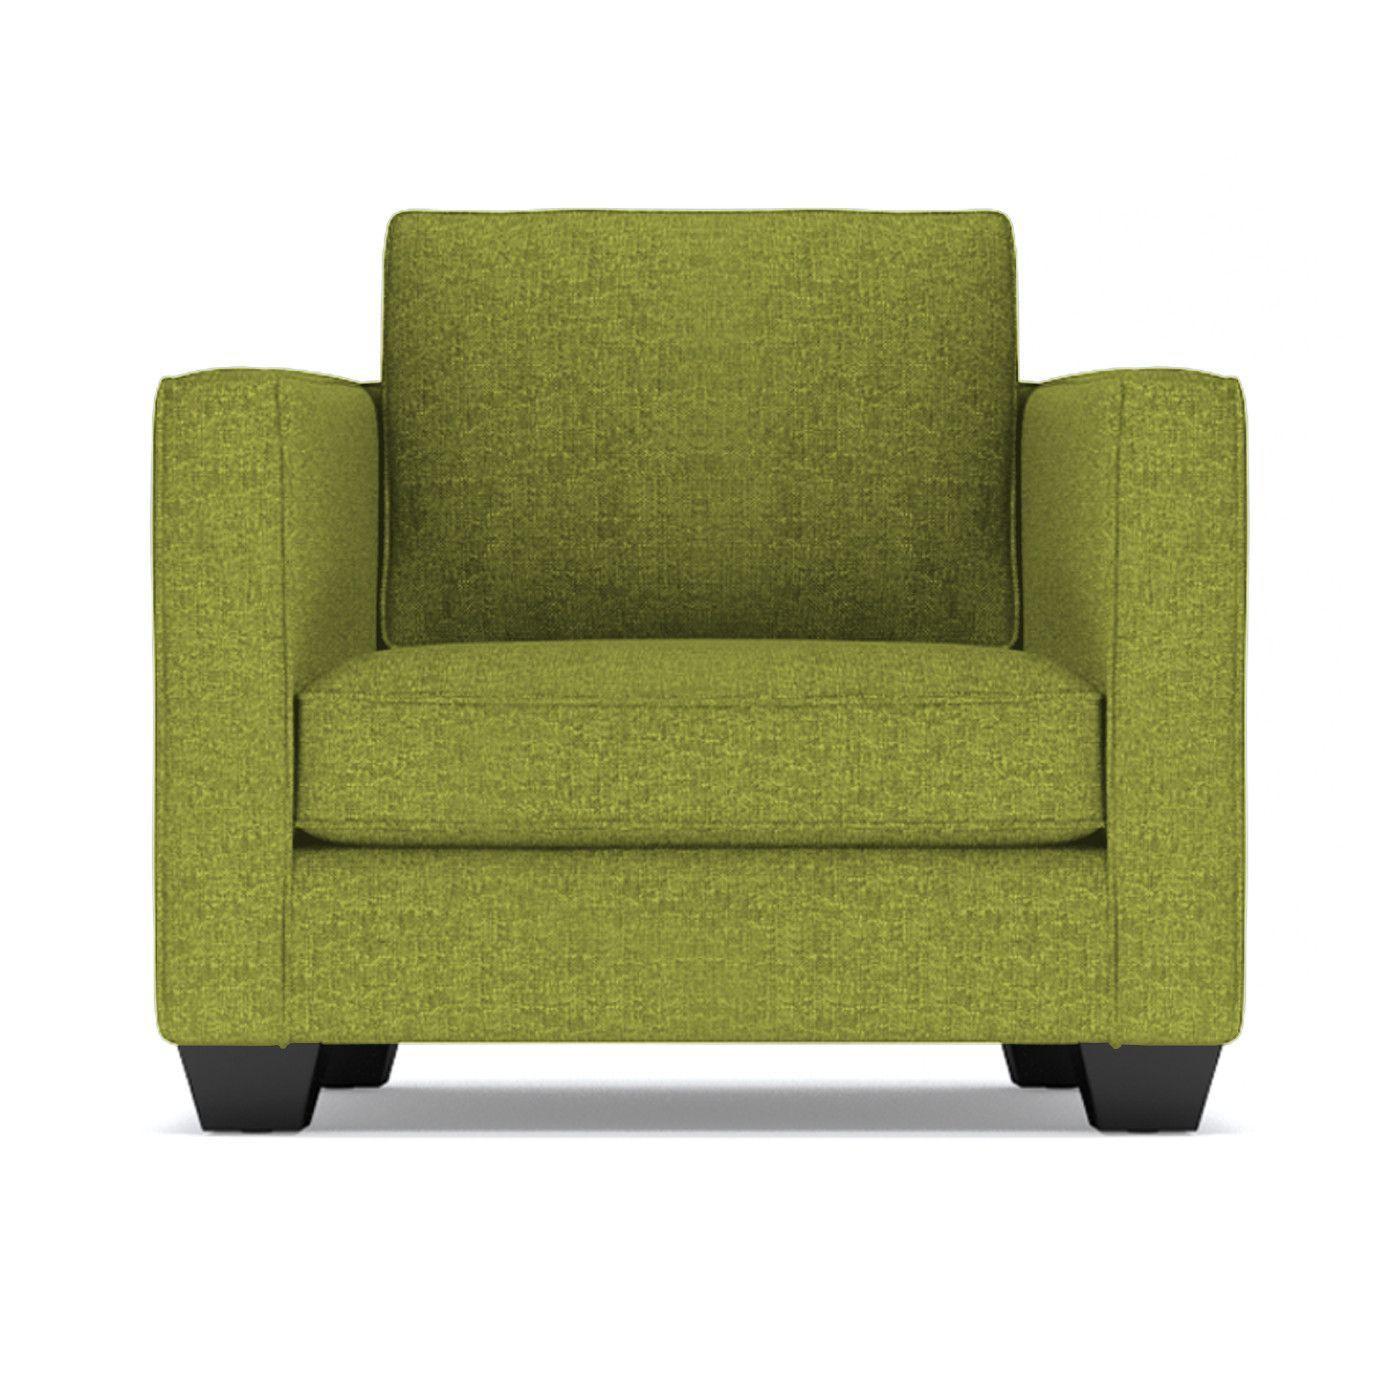 Catalina Chair CHOICE OF FABRICS